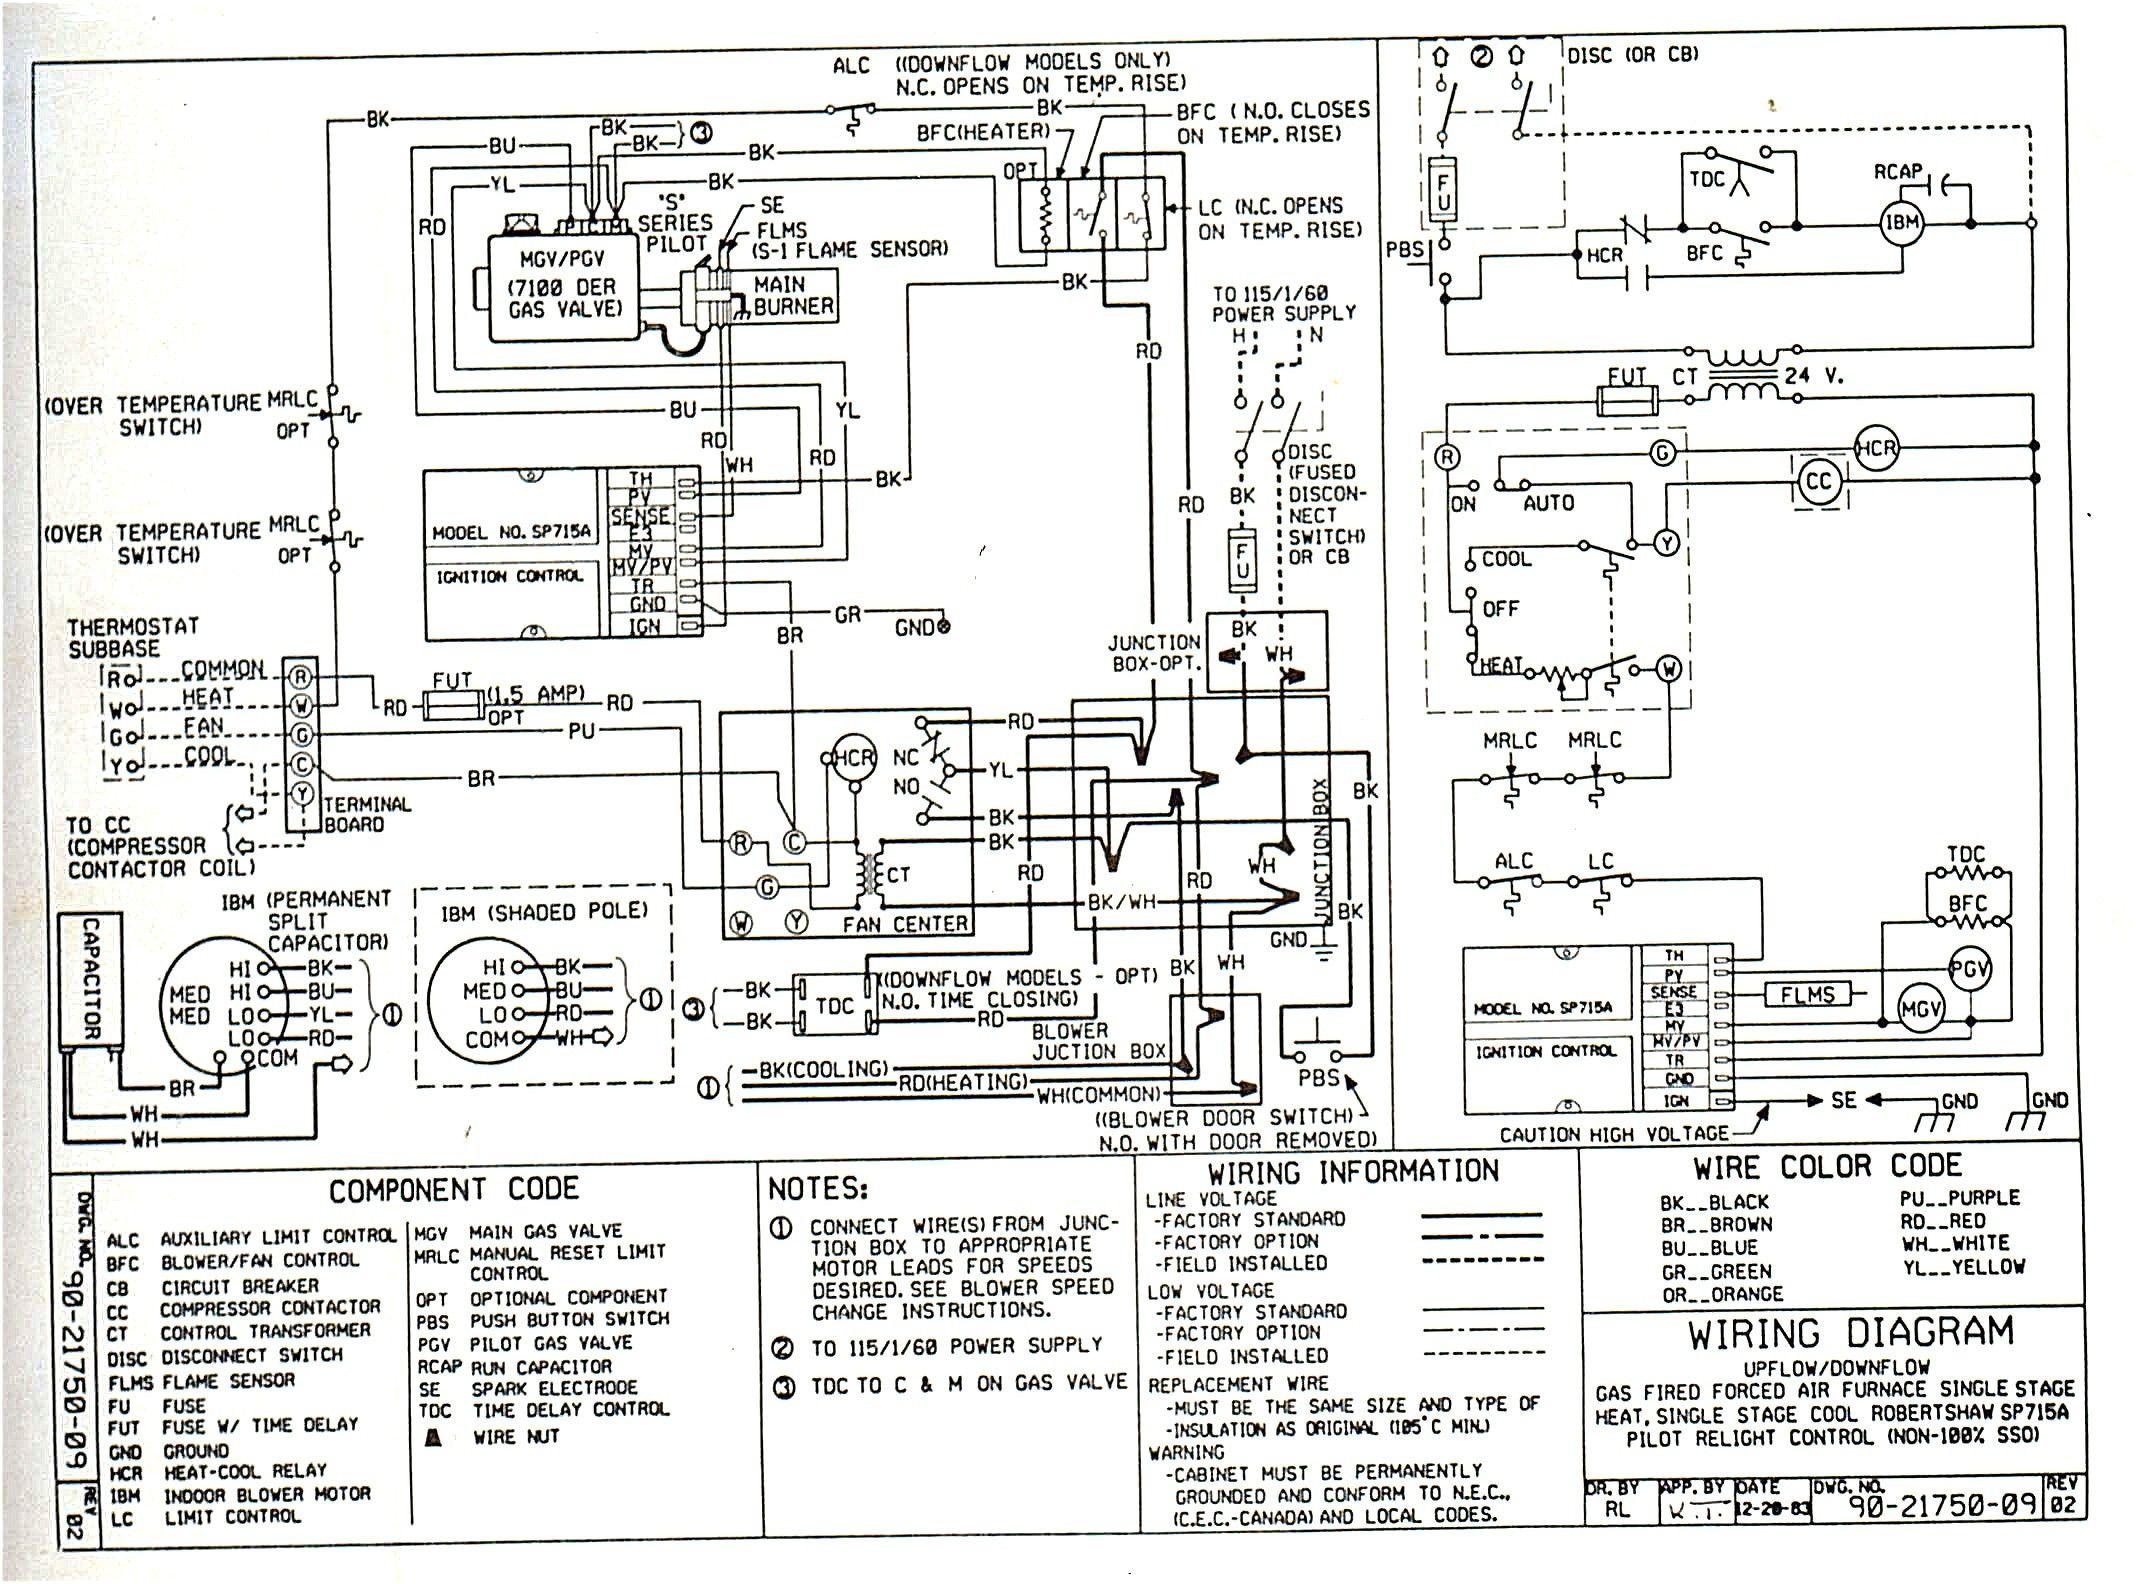 hight resolution of unique wiring diagram ac panasonic diagram diagramtemplate unique wiring diagram ac panasonic diagram diagramtemplate diagramsample